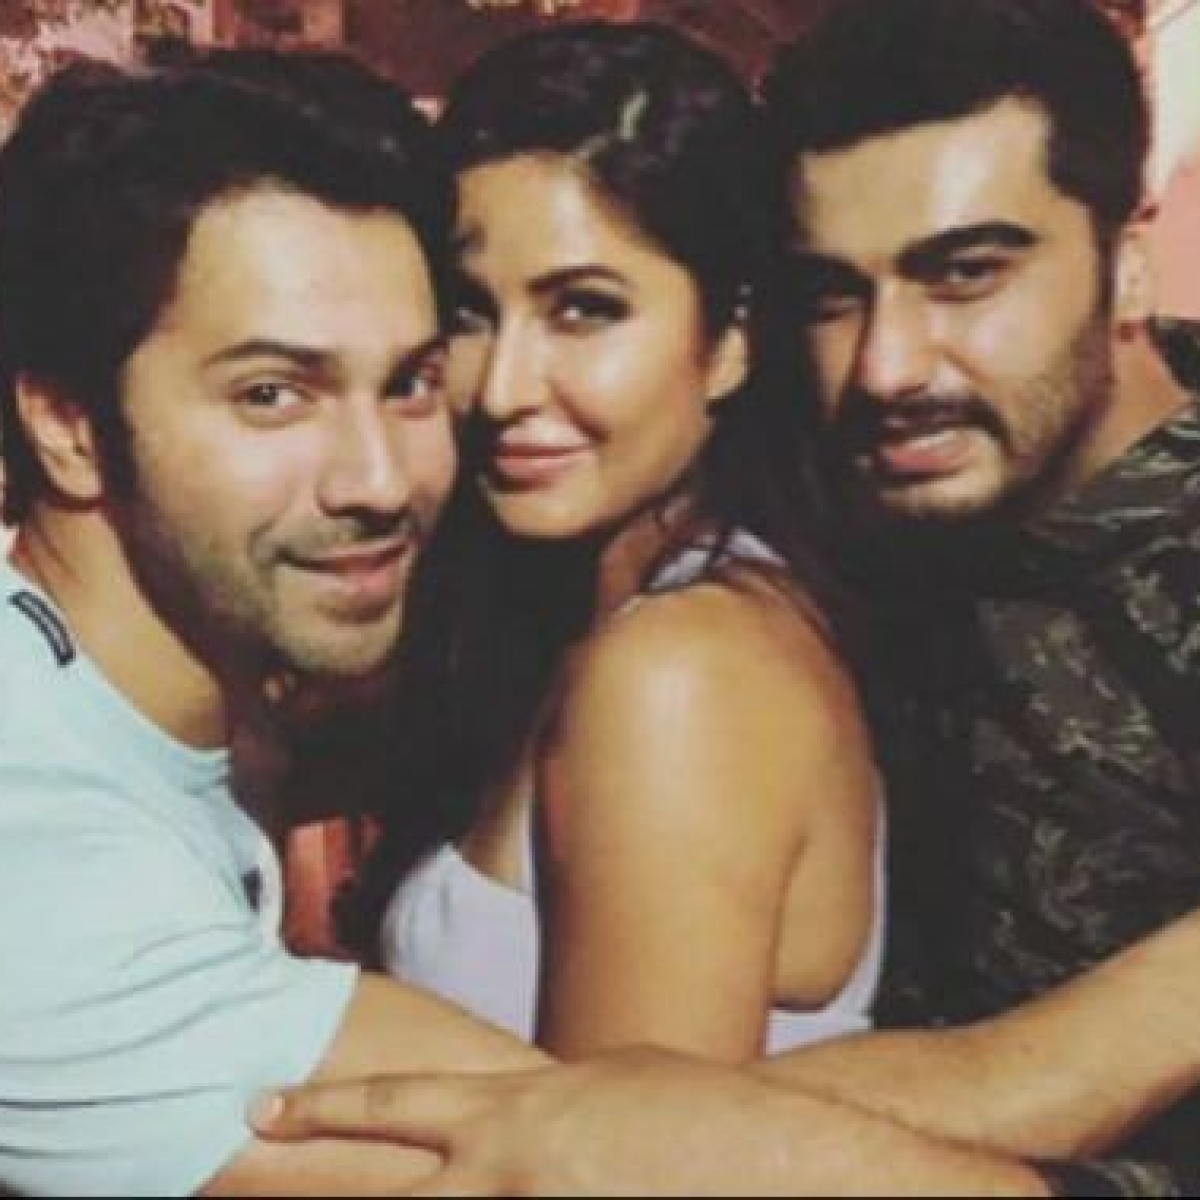 Katrina Kaif shares adorable throwback pictures to wish Arjun Kapoor on birthday